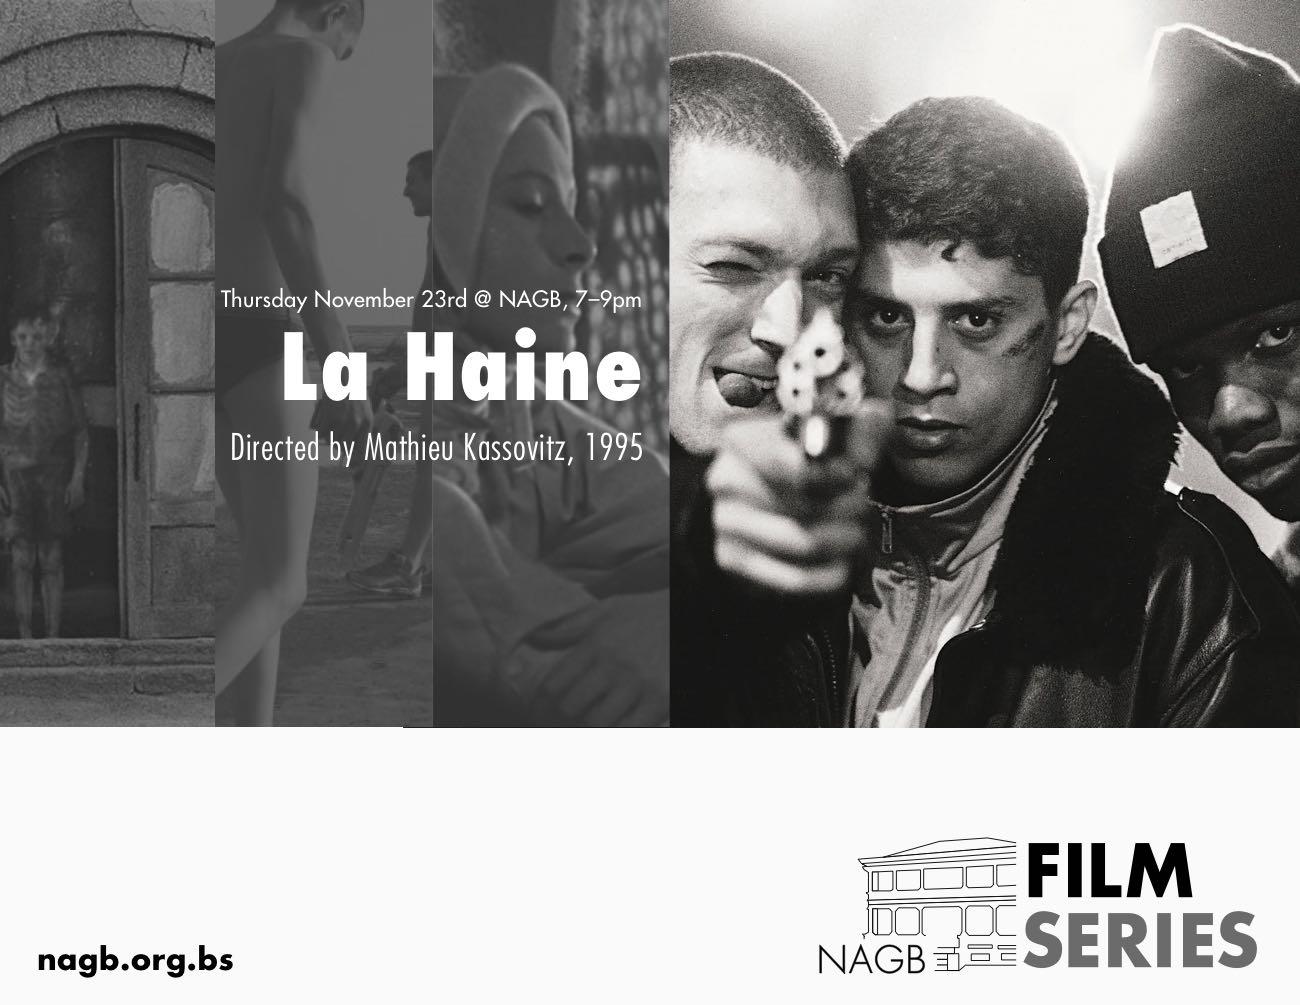 La Haine November Film.jpg